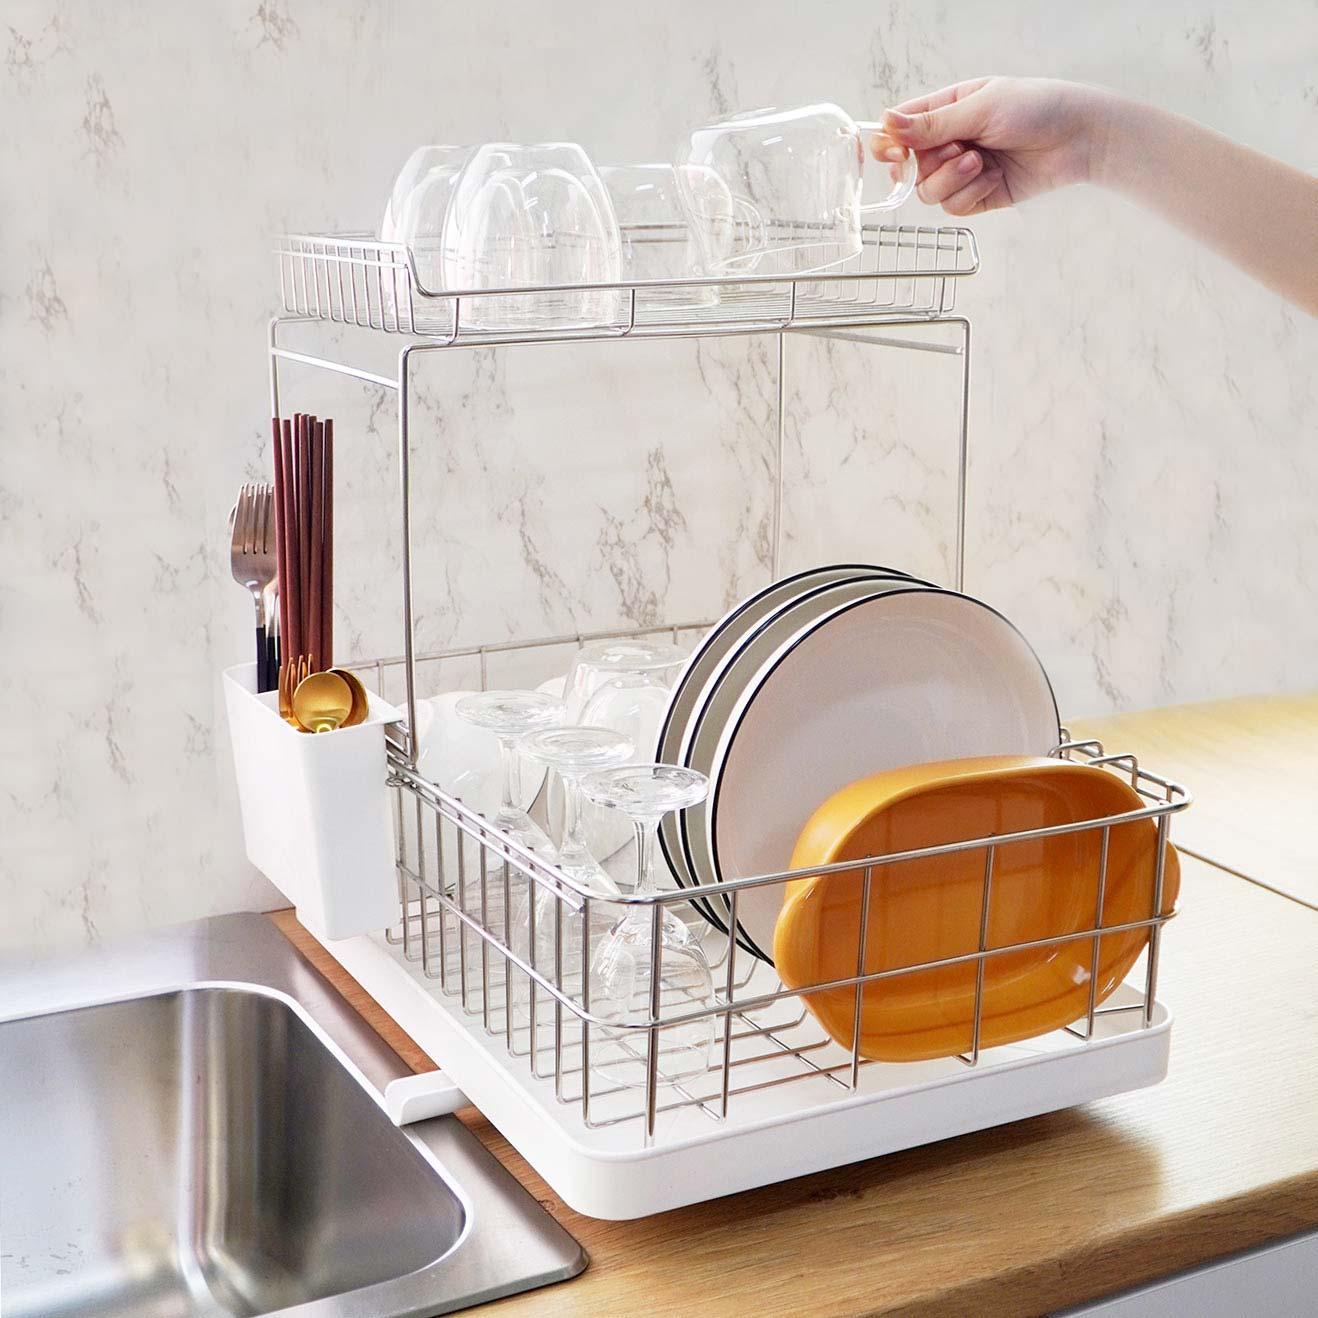 Double Layer Stainless Steel Dish Drainer Rack Kitchen Sink Organizer